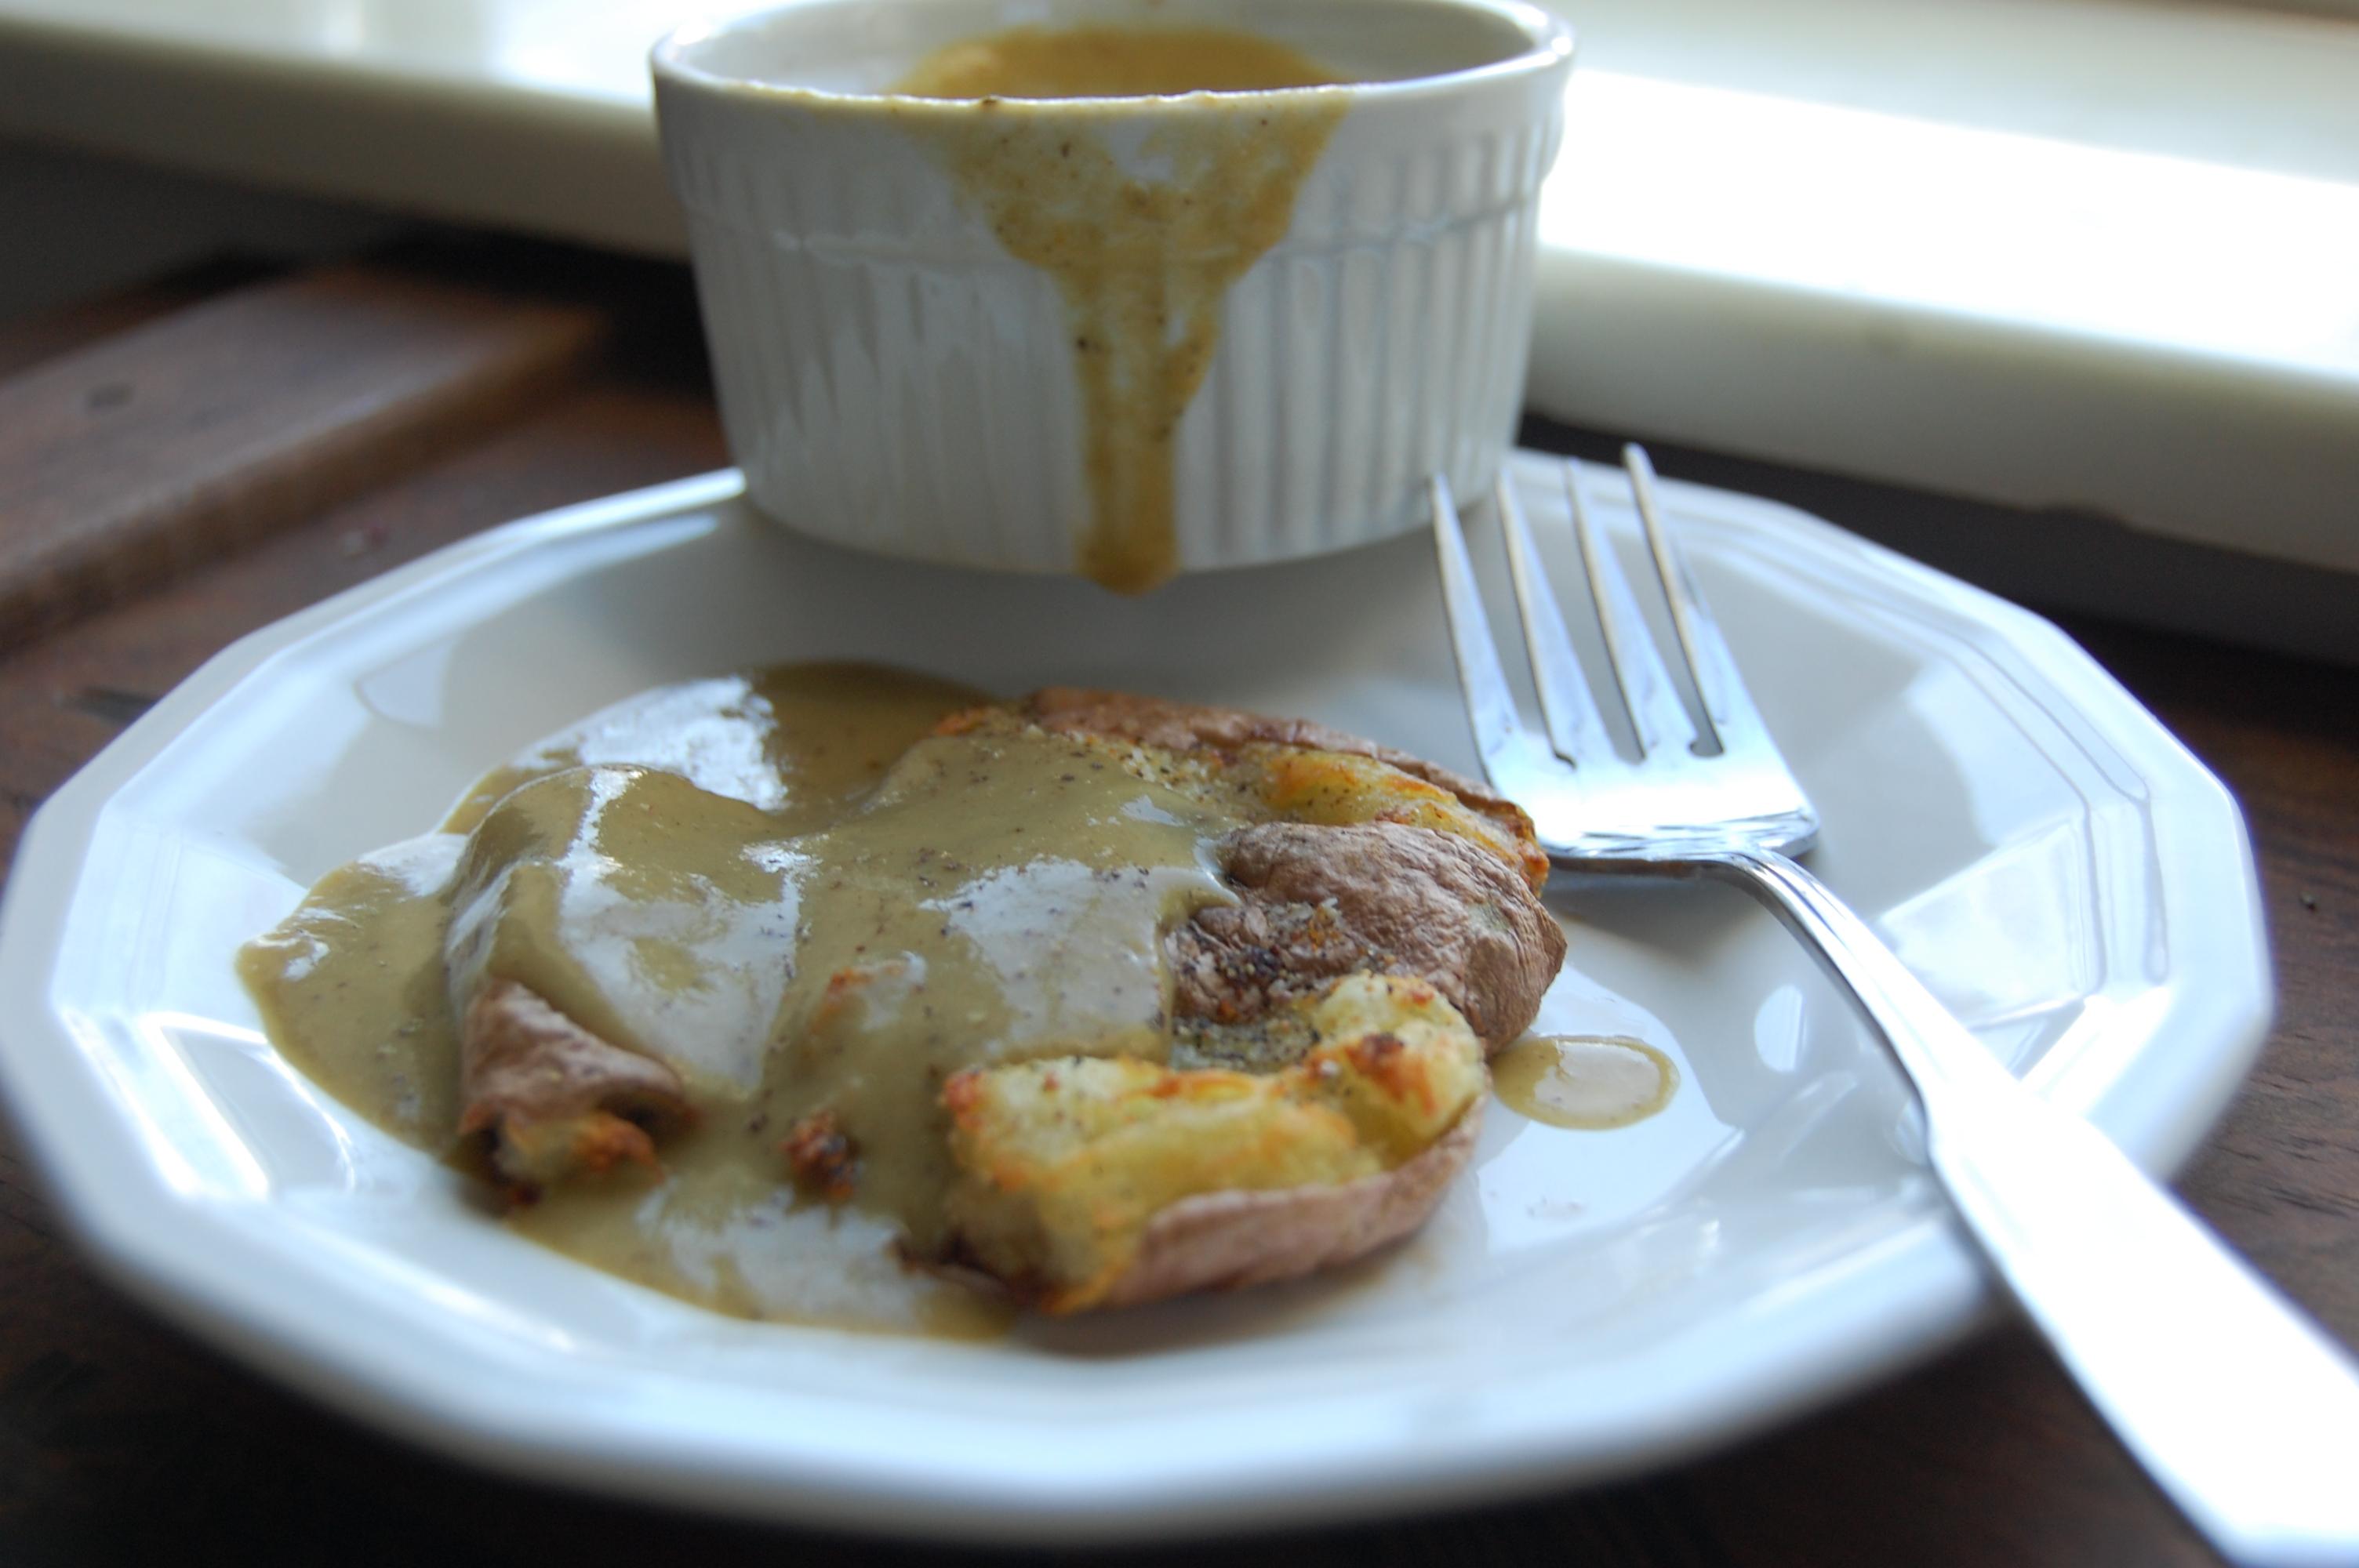 The proper way to eat gravy. Smothering a crispy smashed potato.